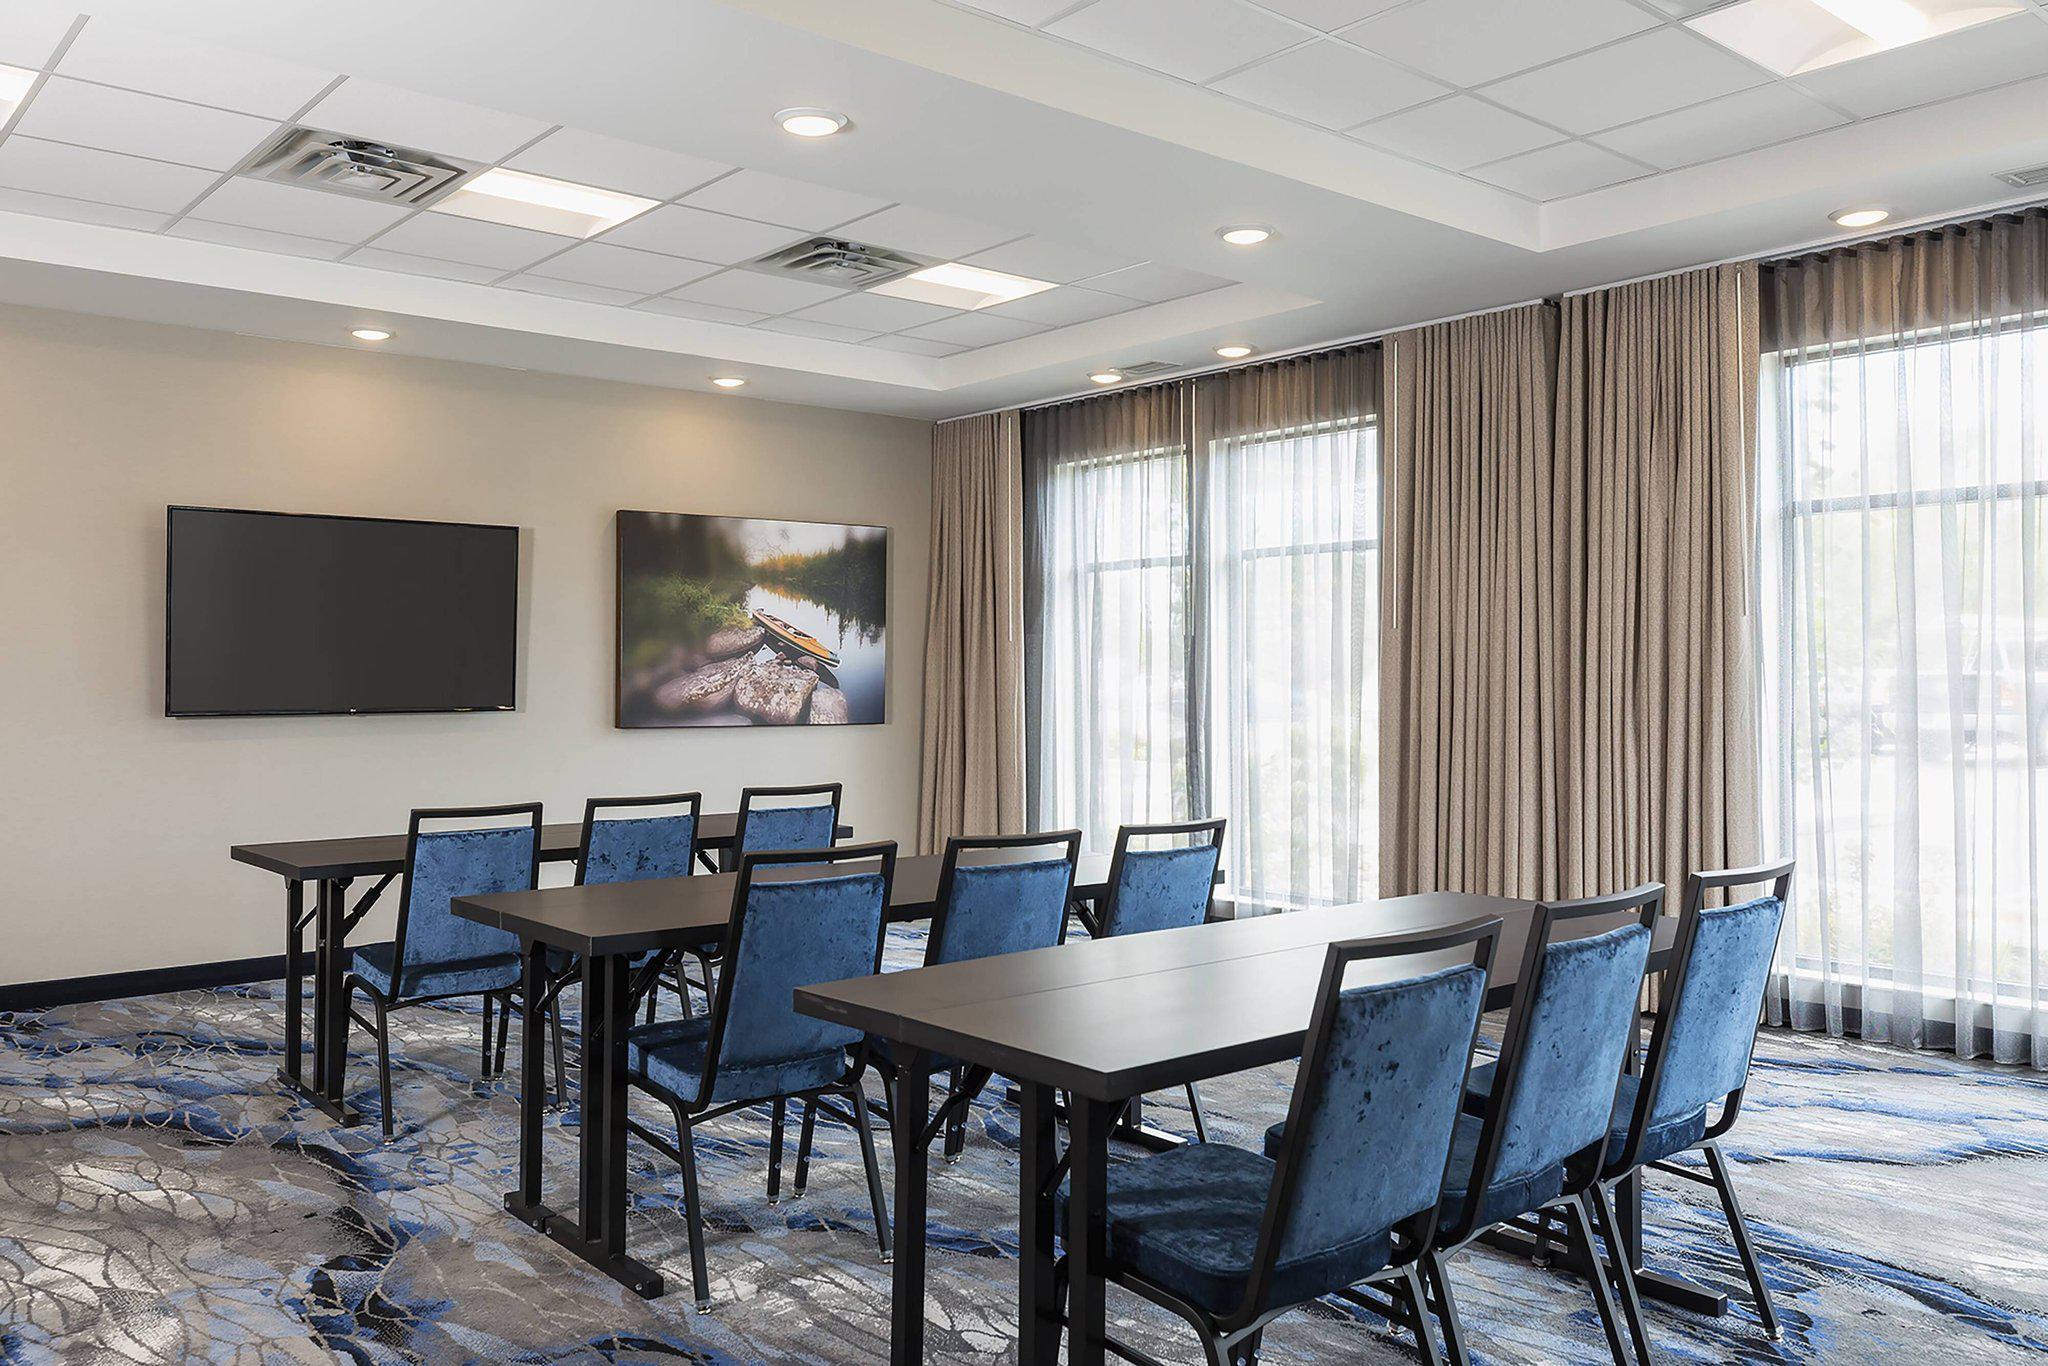 Fairfield Inn & Suites by Marriott Minneapolis North/Blaine